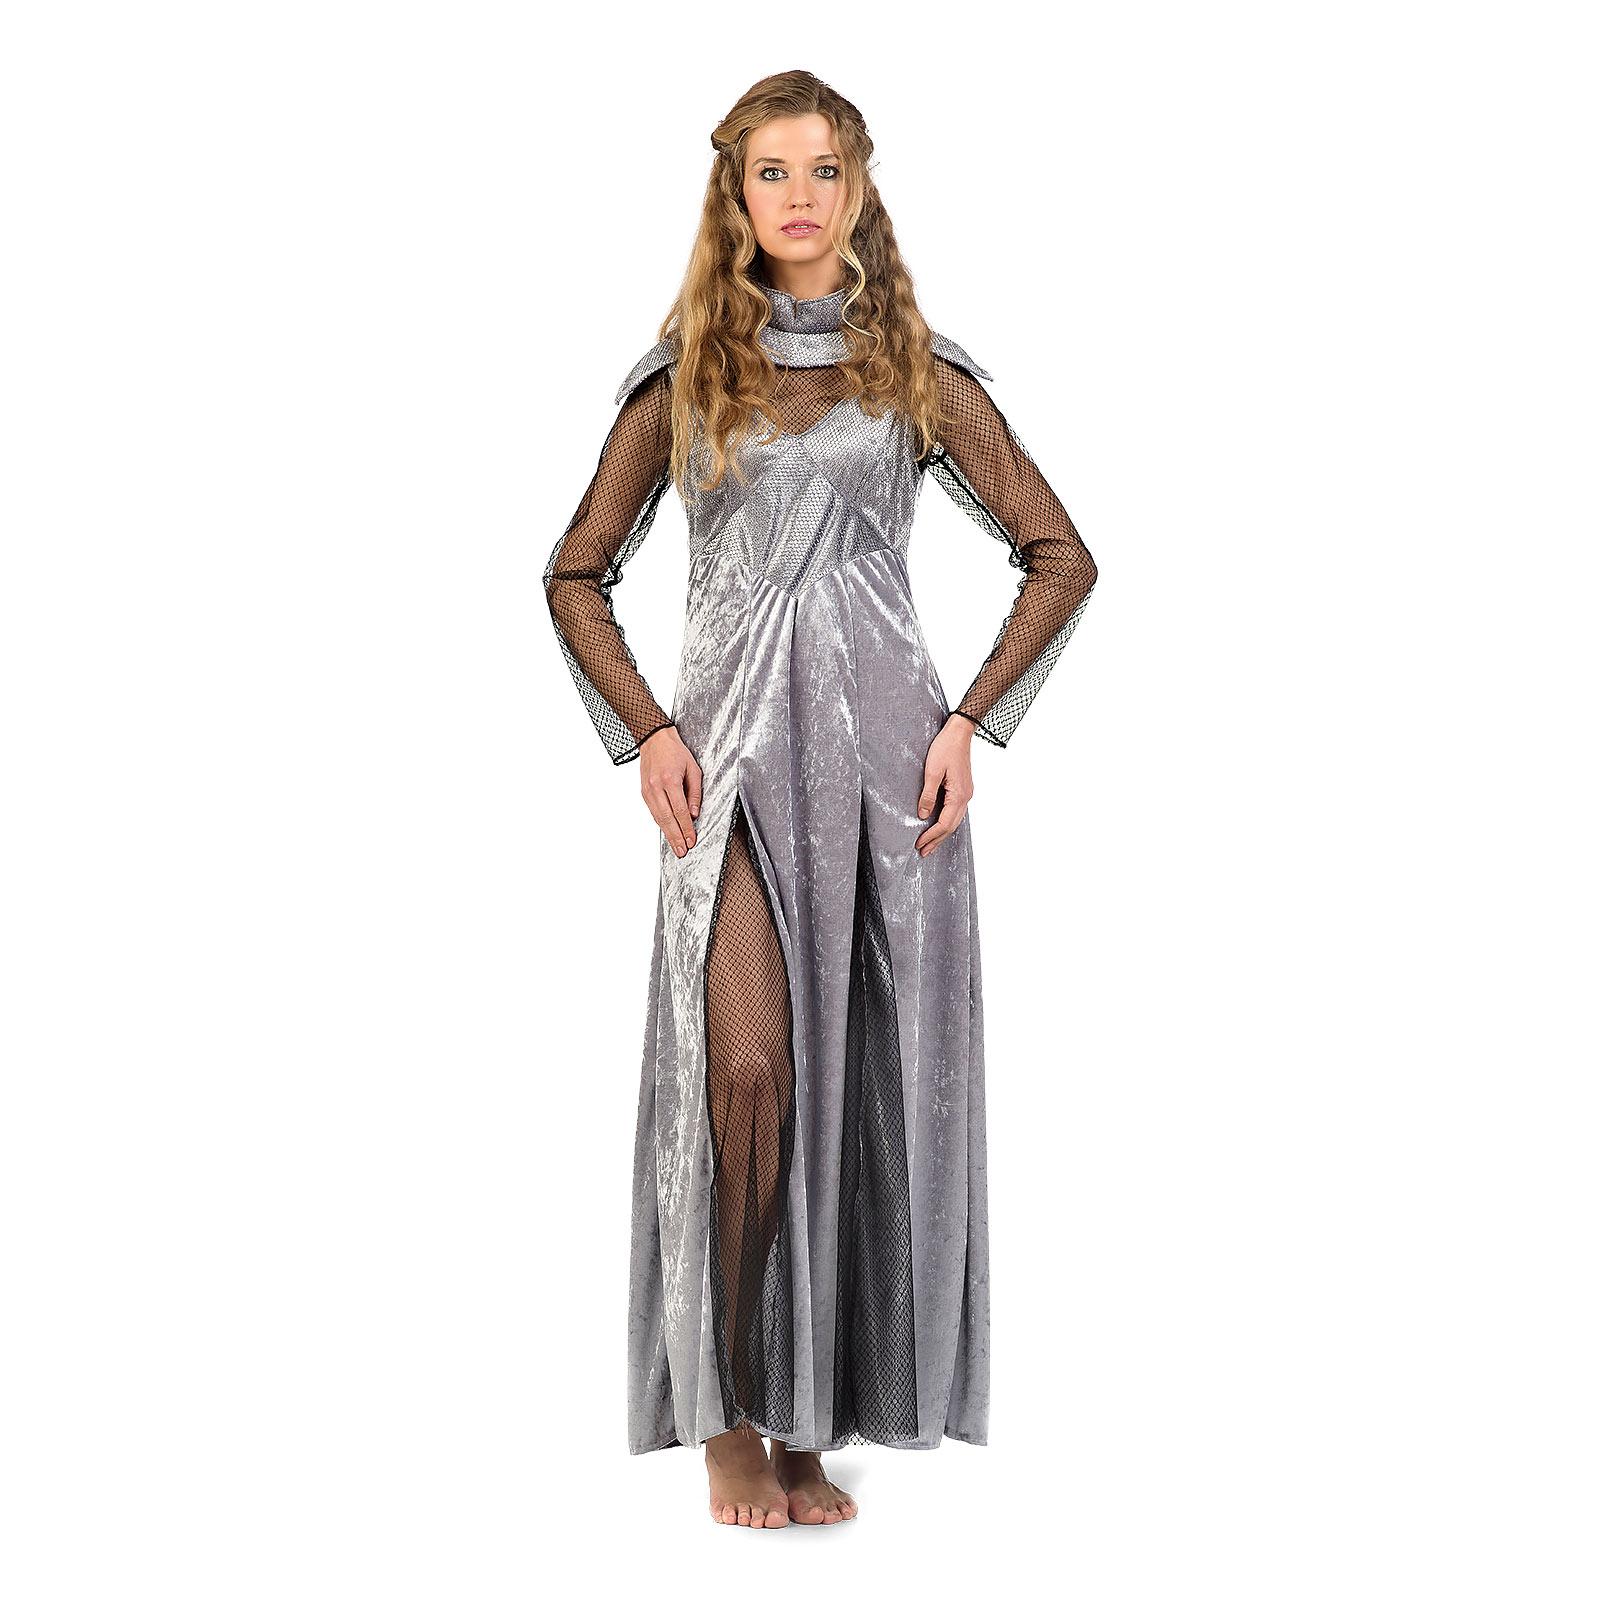 Prinzessin Kostüm Damen